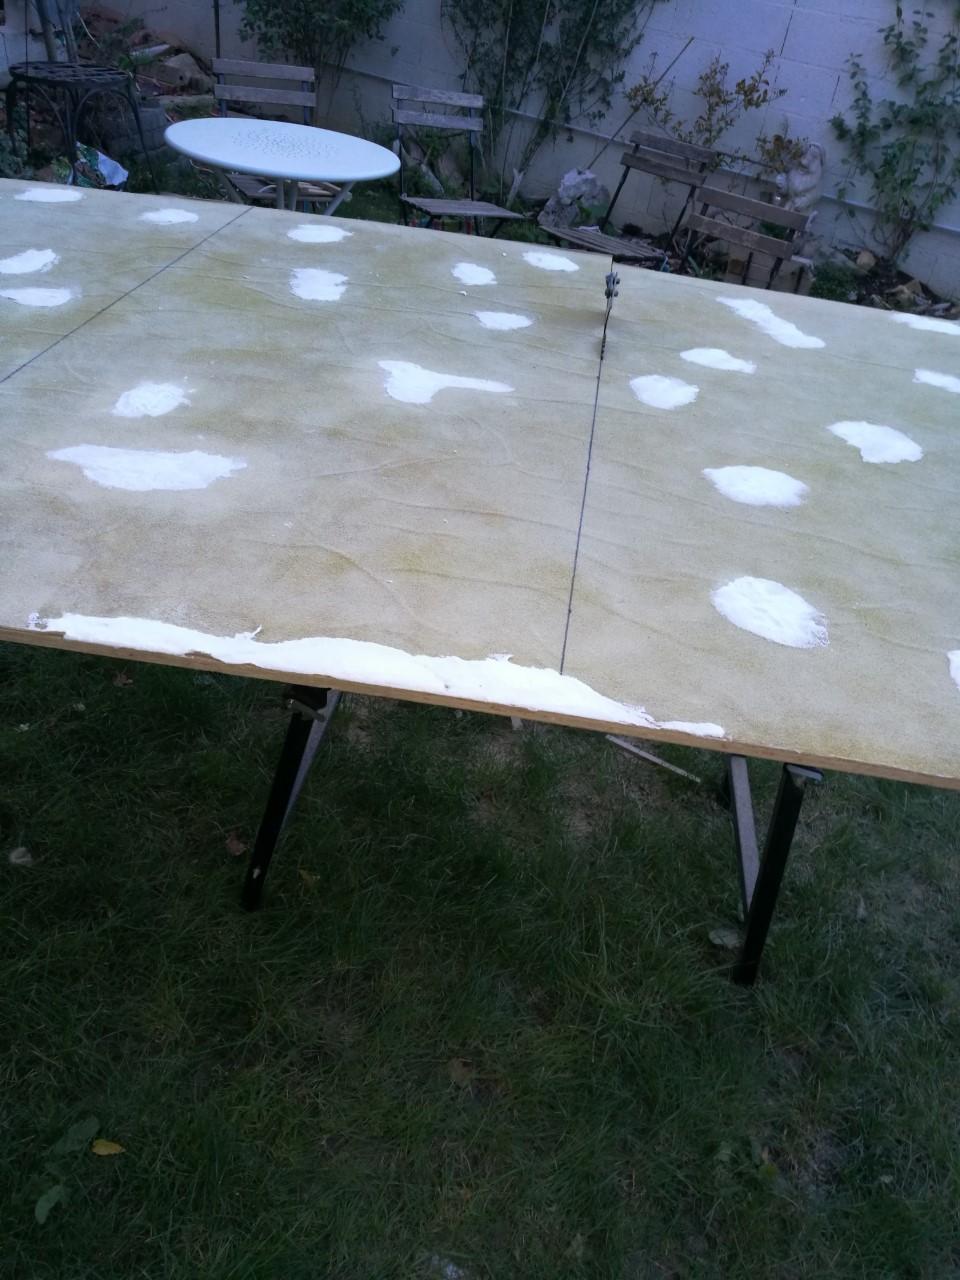 table de jeu enneigée Thumbn33